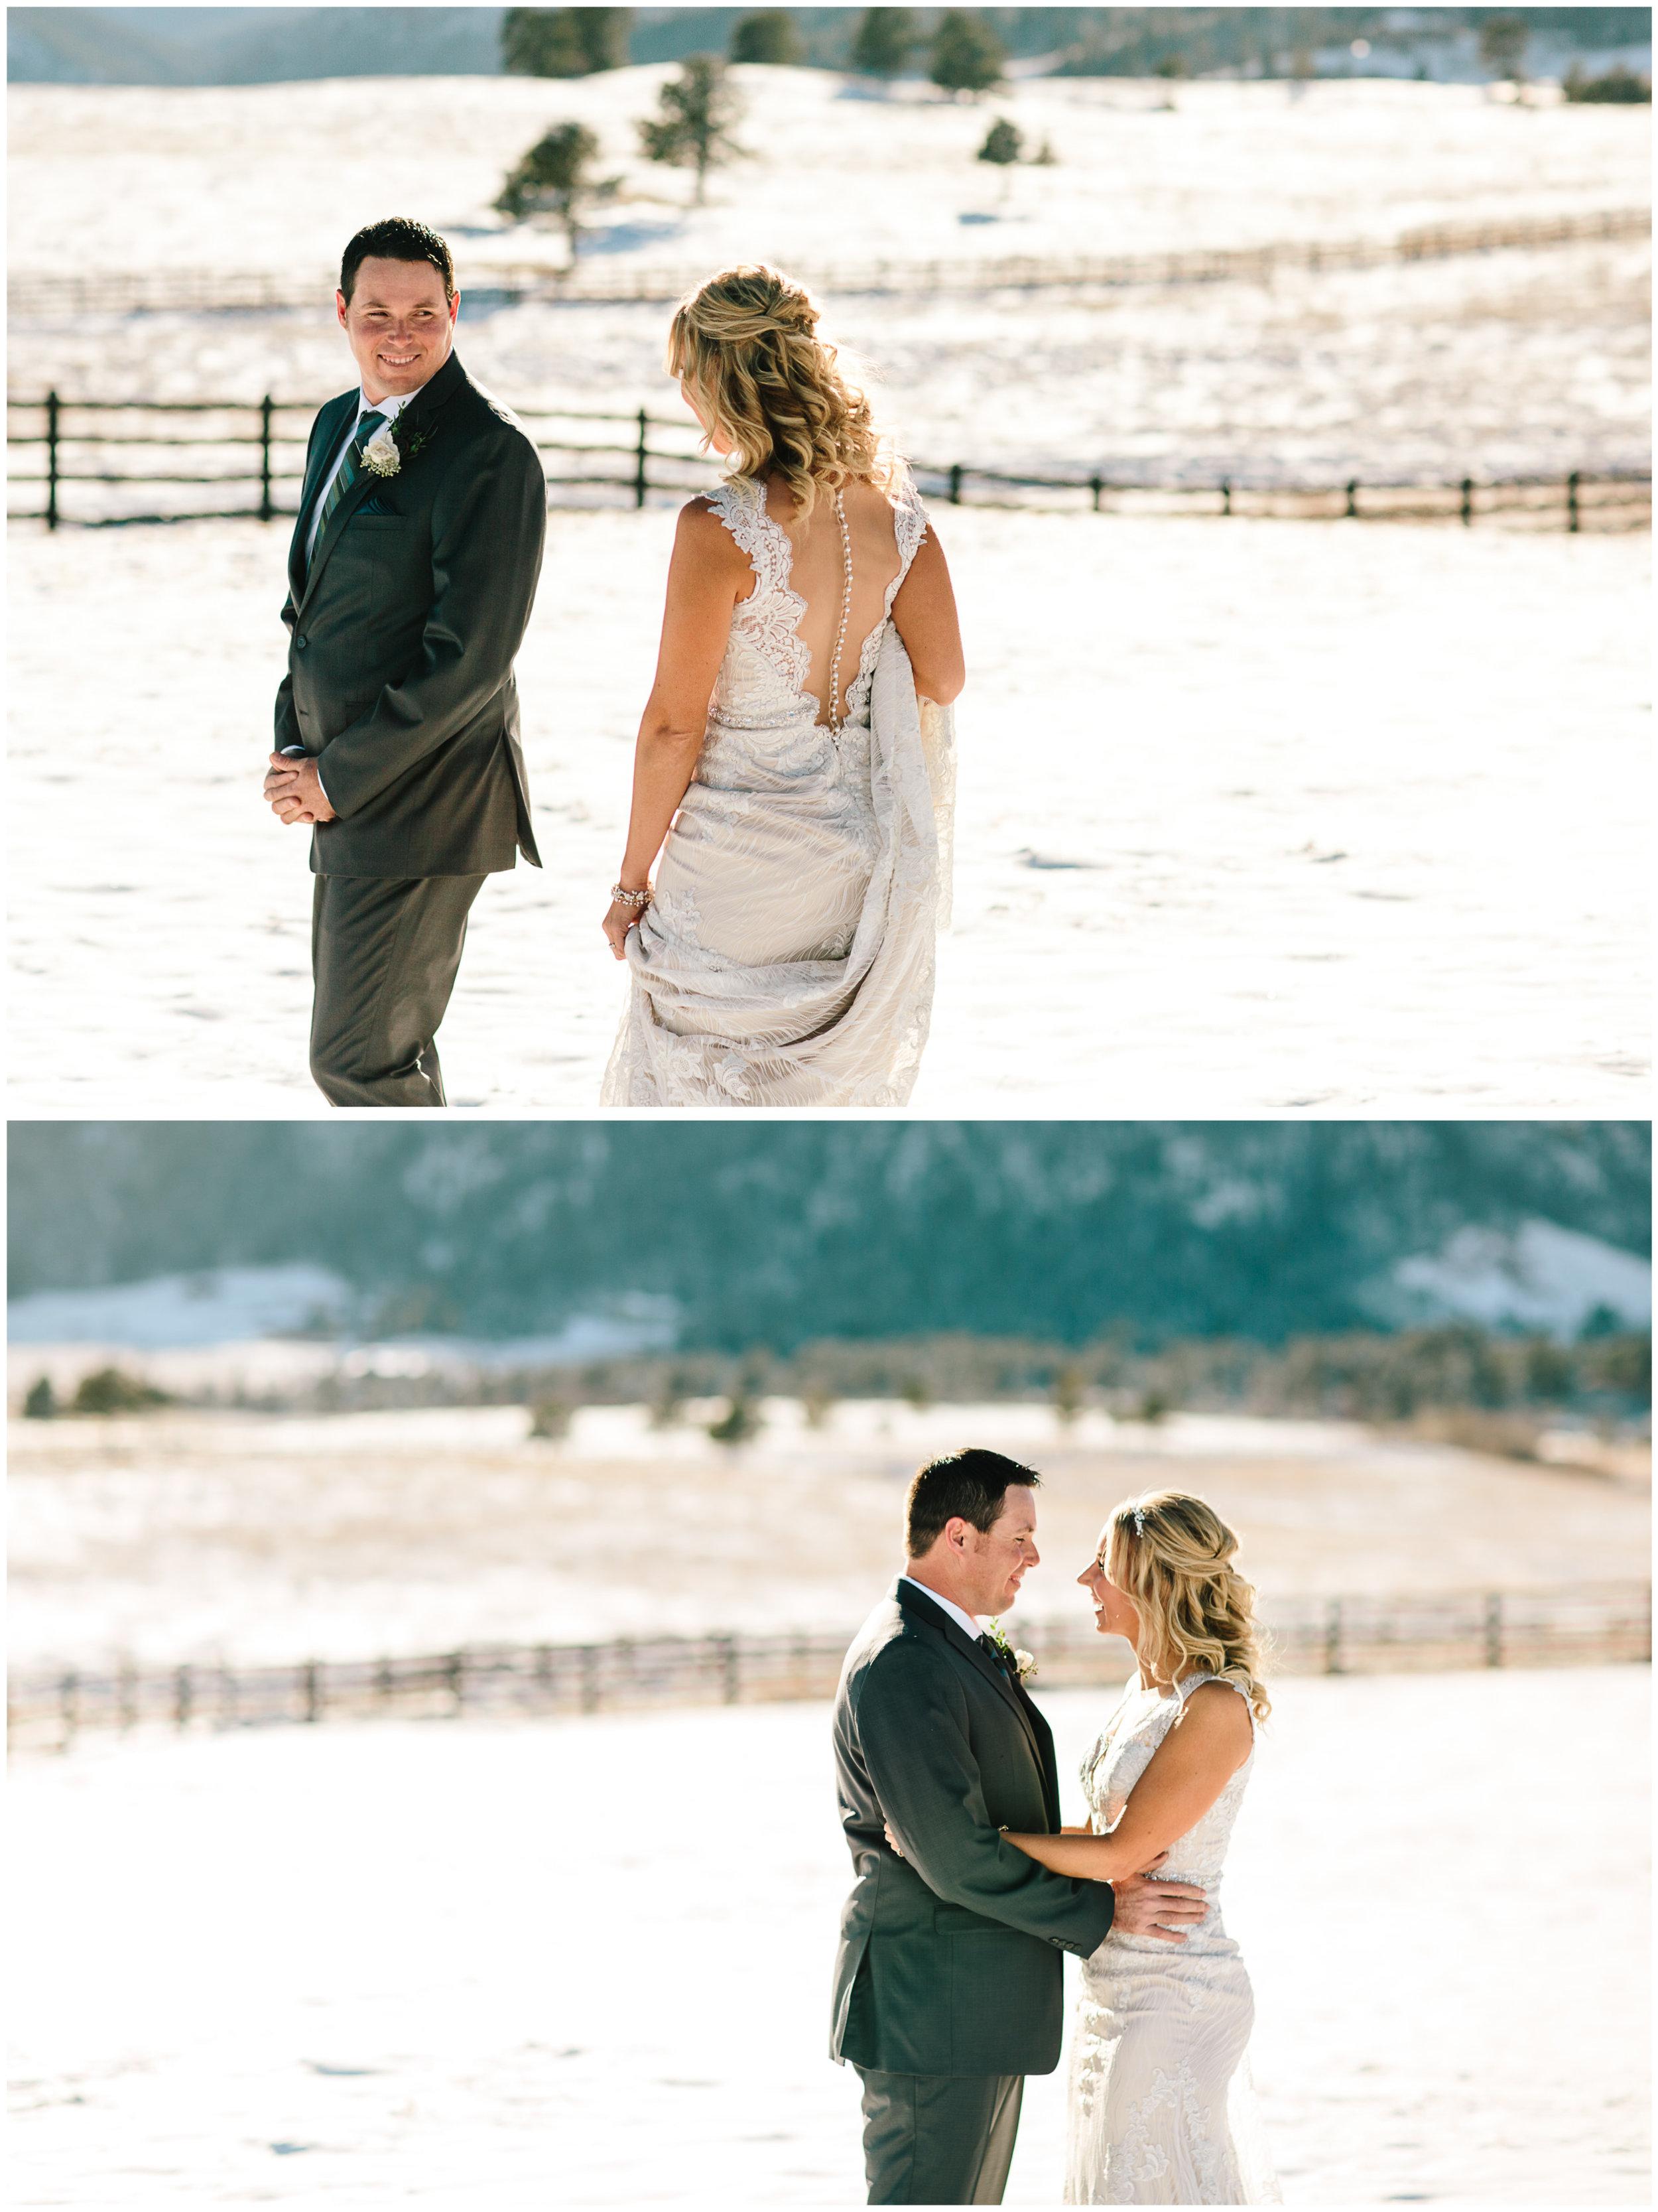 spruce_mountain_ranch_wedding_19.jpg